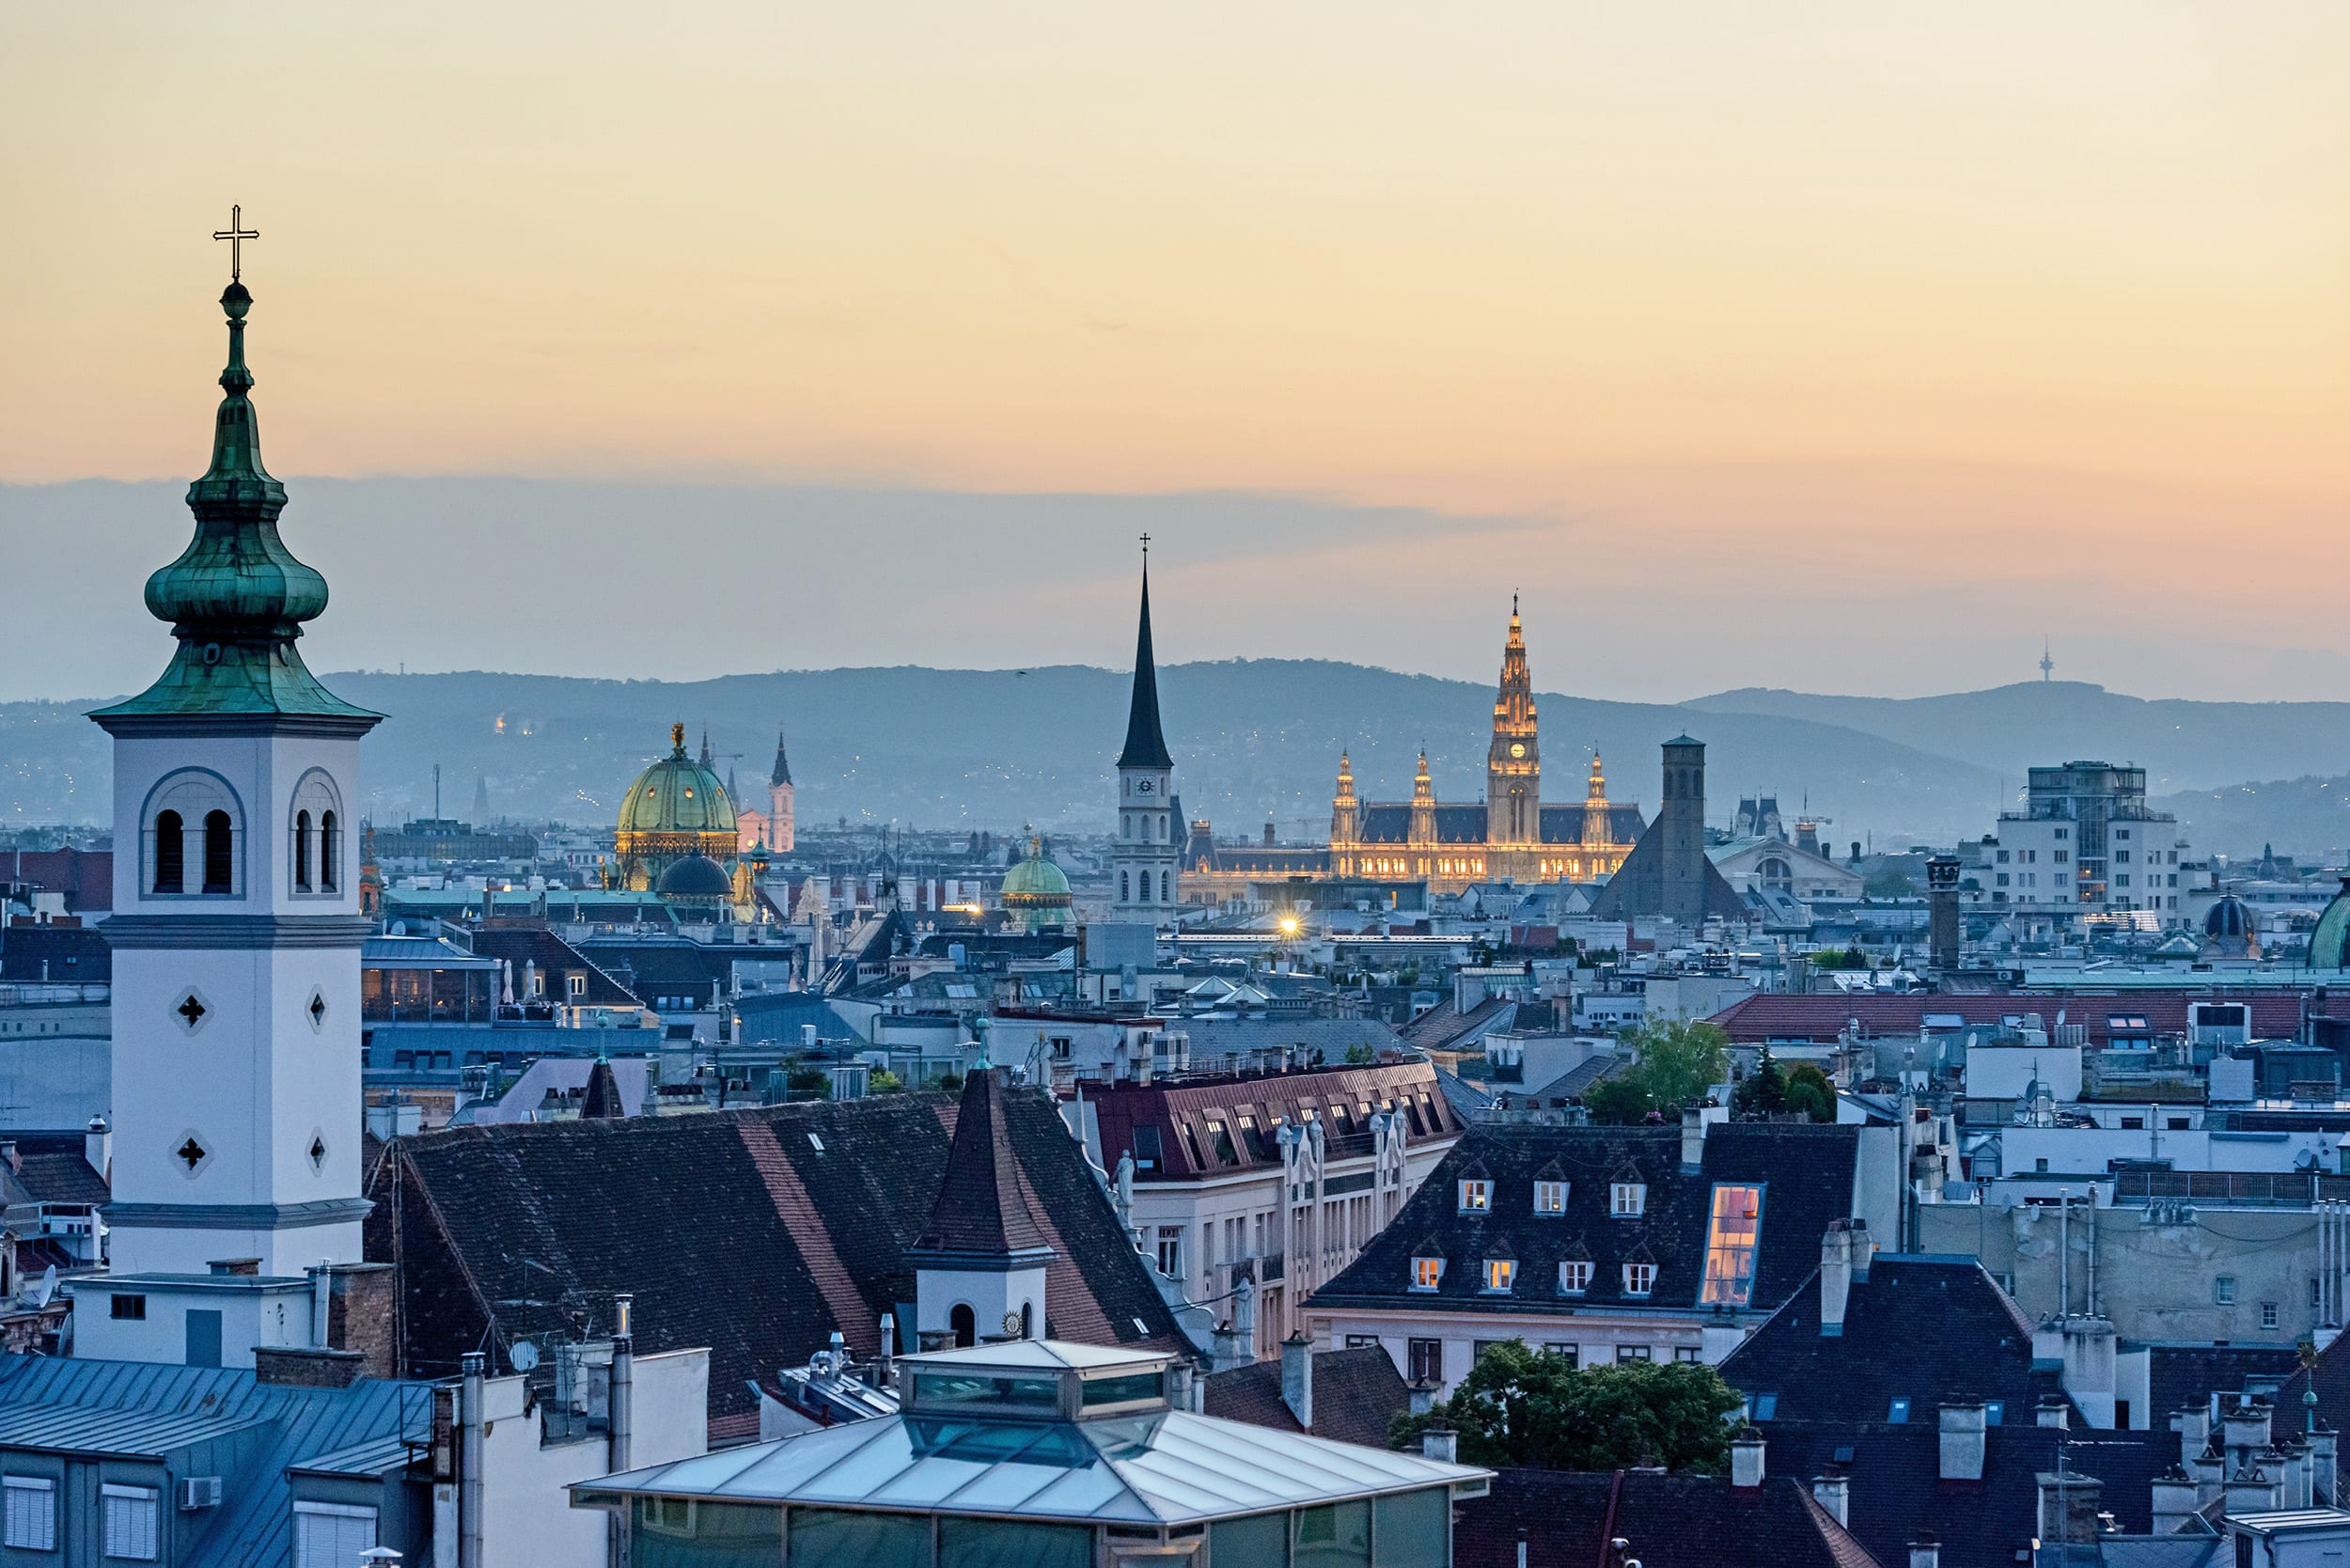 View of Vienna at night